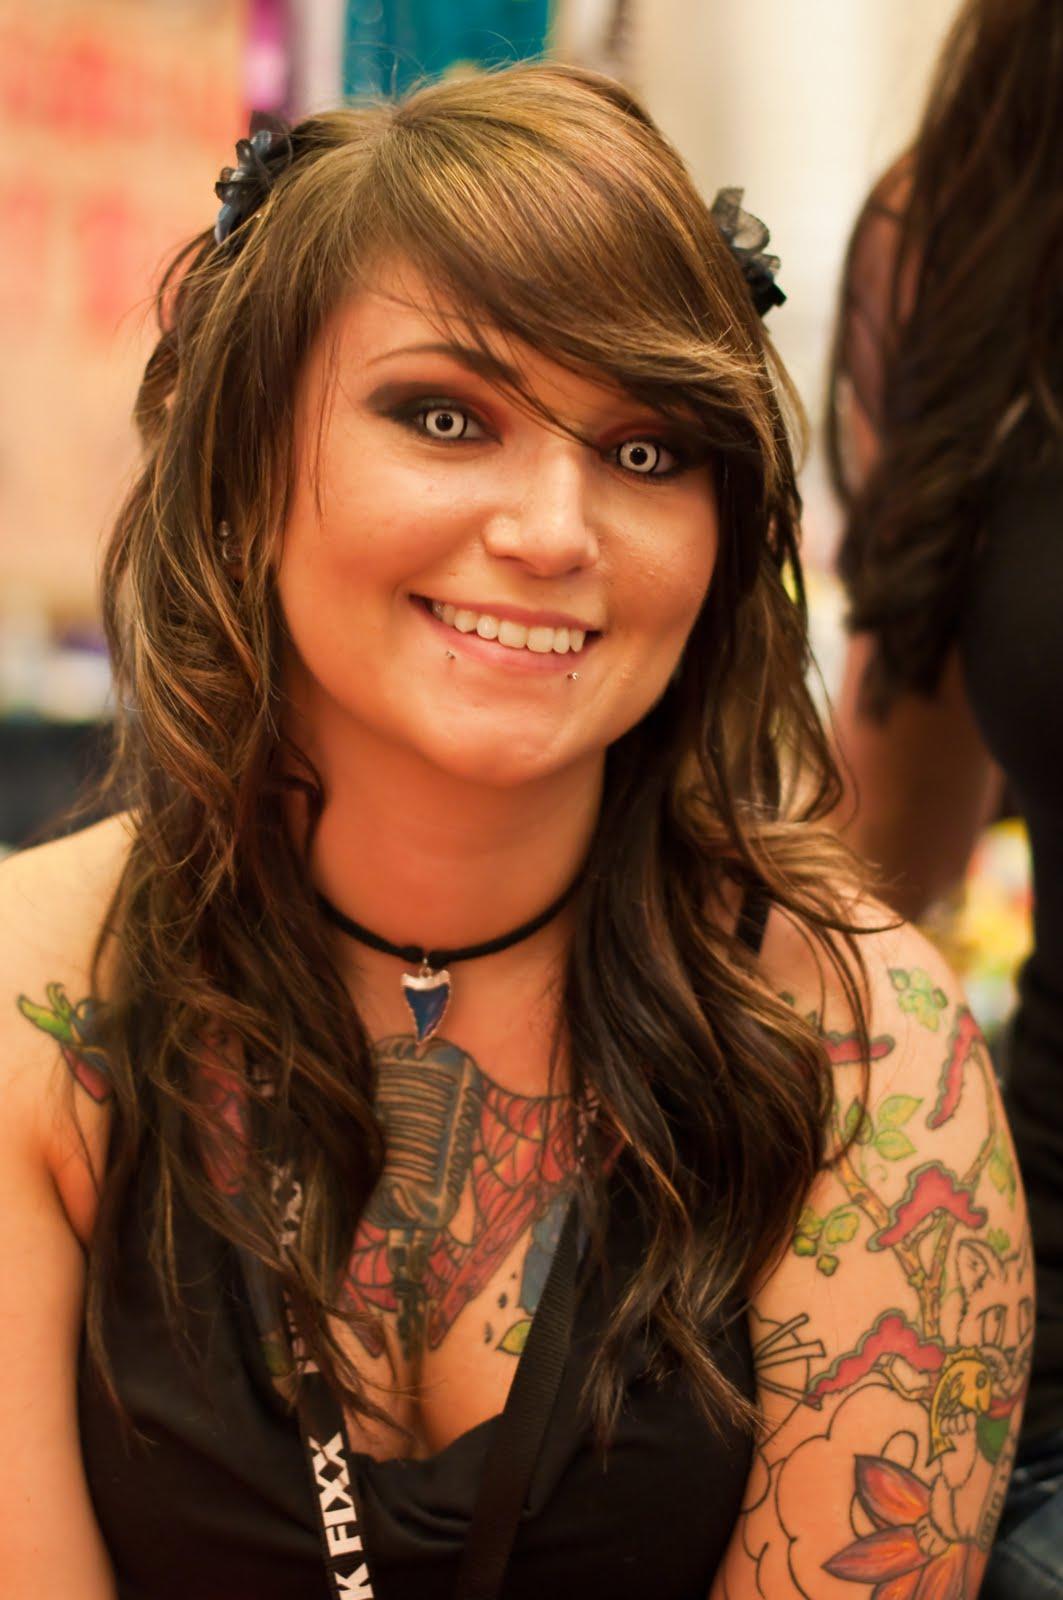 Focused Photographer: South Florida Tattoo Expo